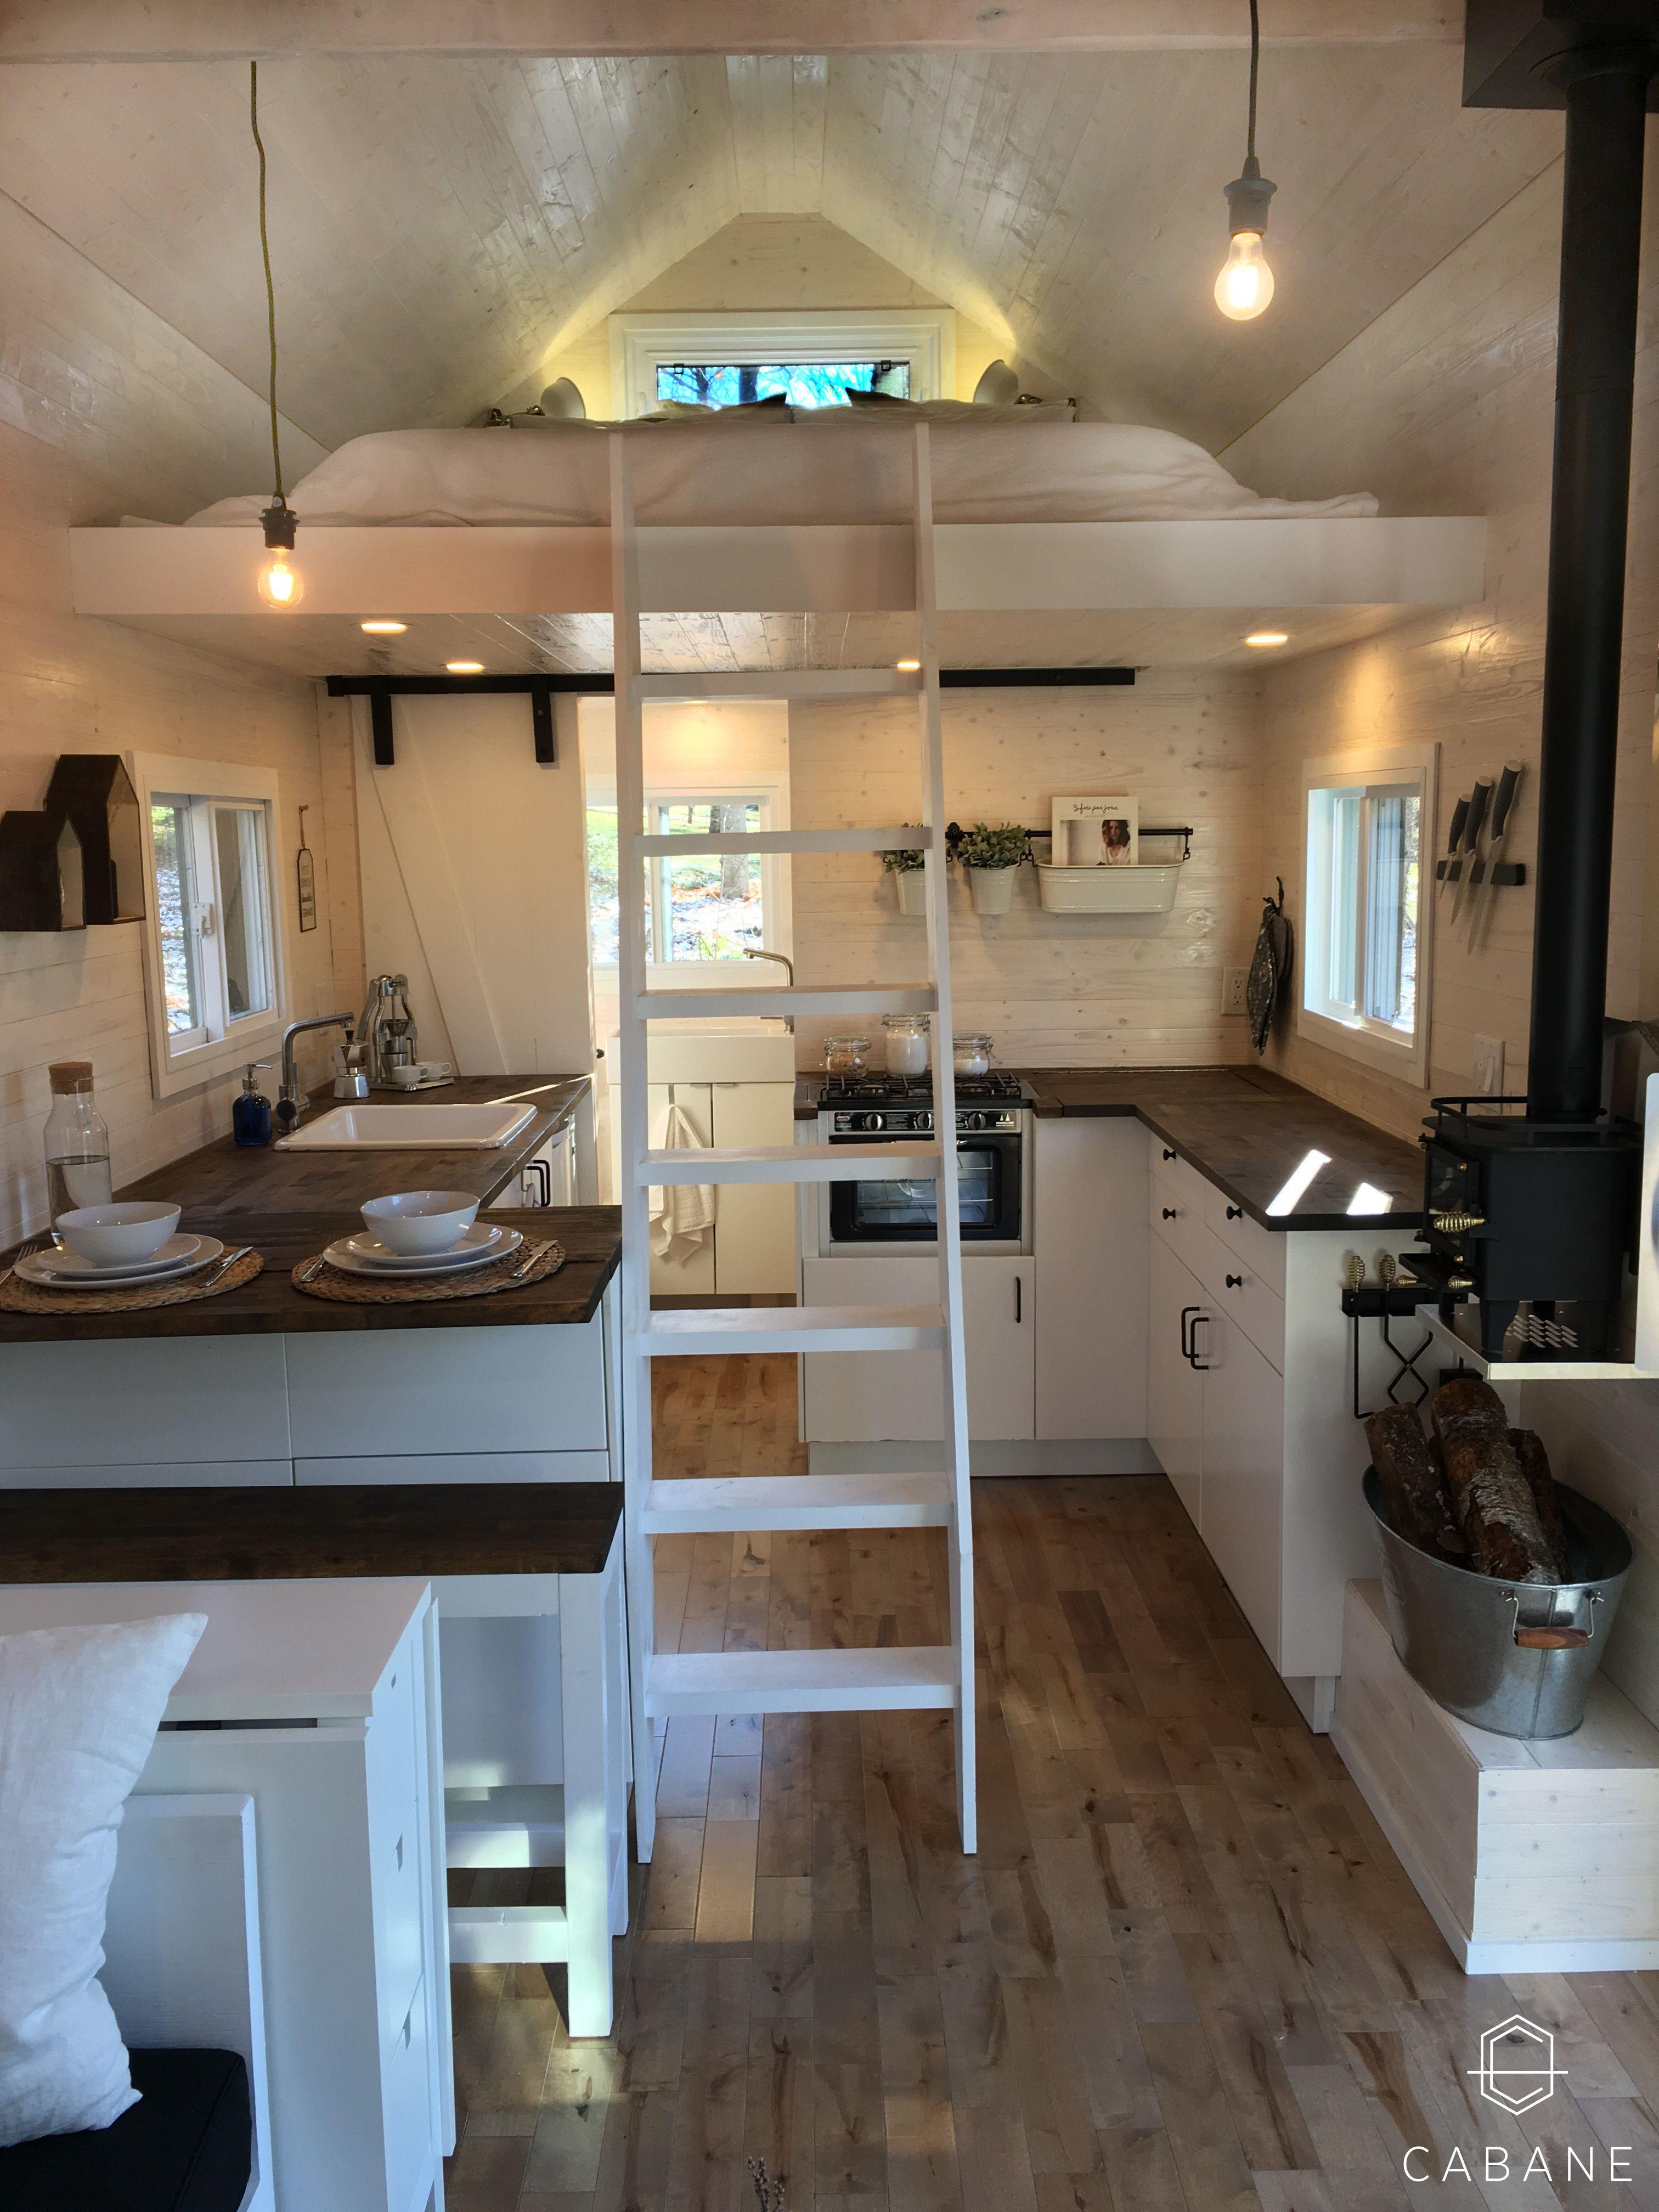 Mini-Maison CABANE - Intérieur / Tiny House CABANE - Interior ...